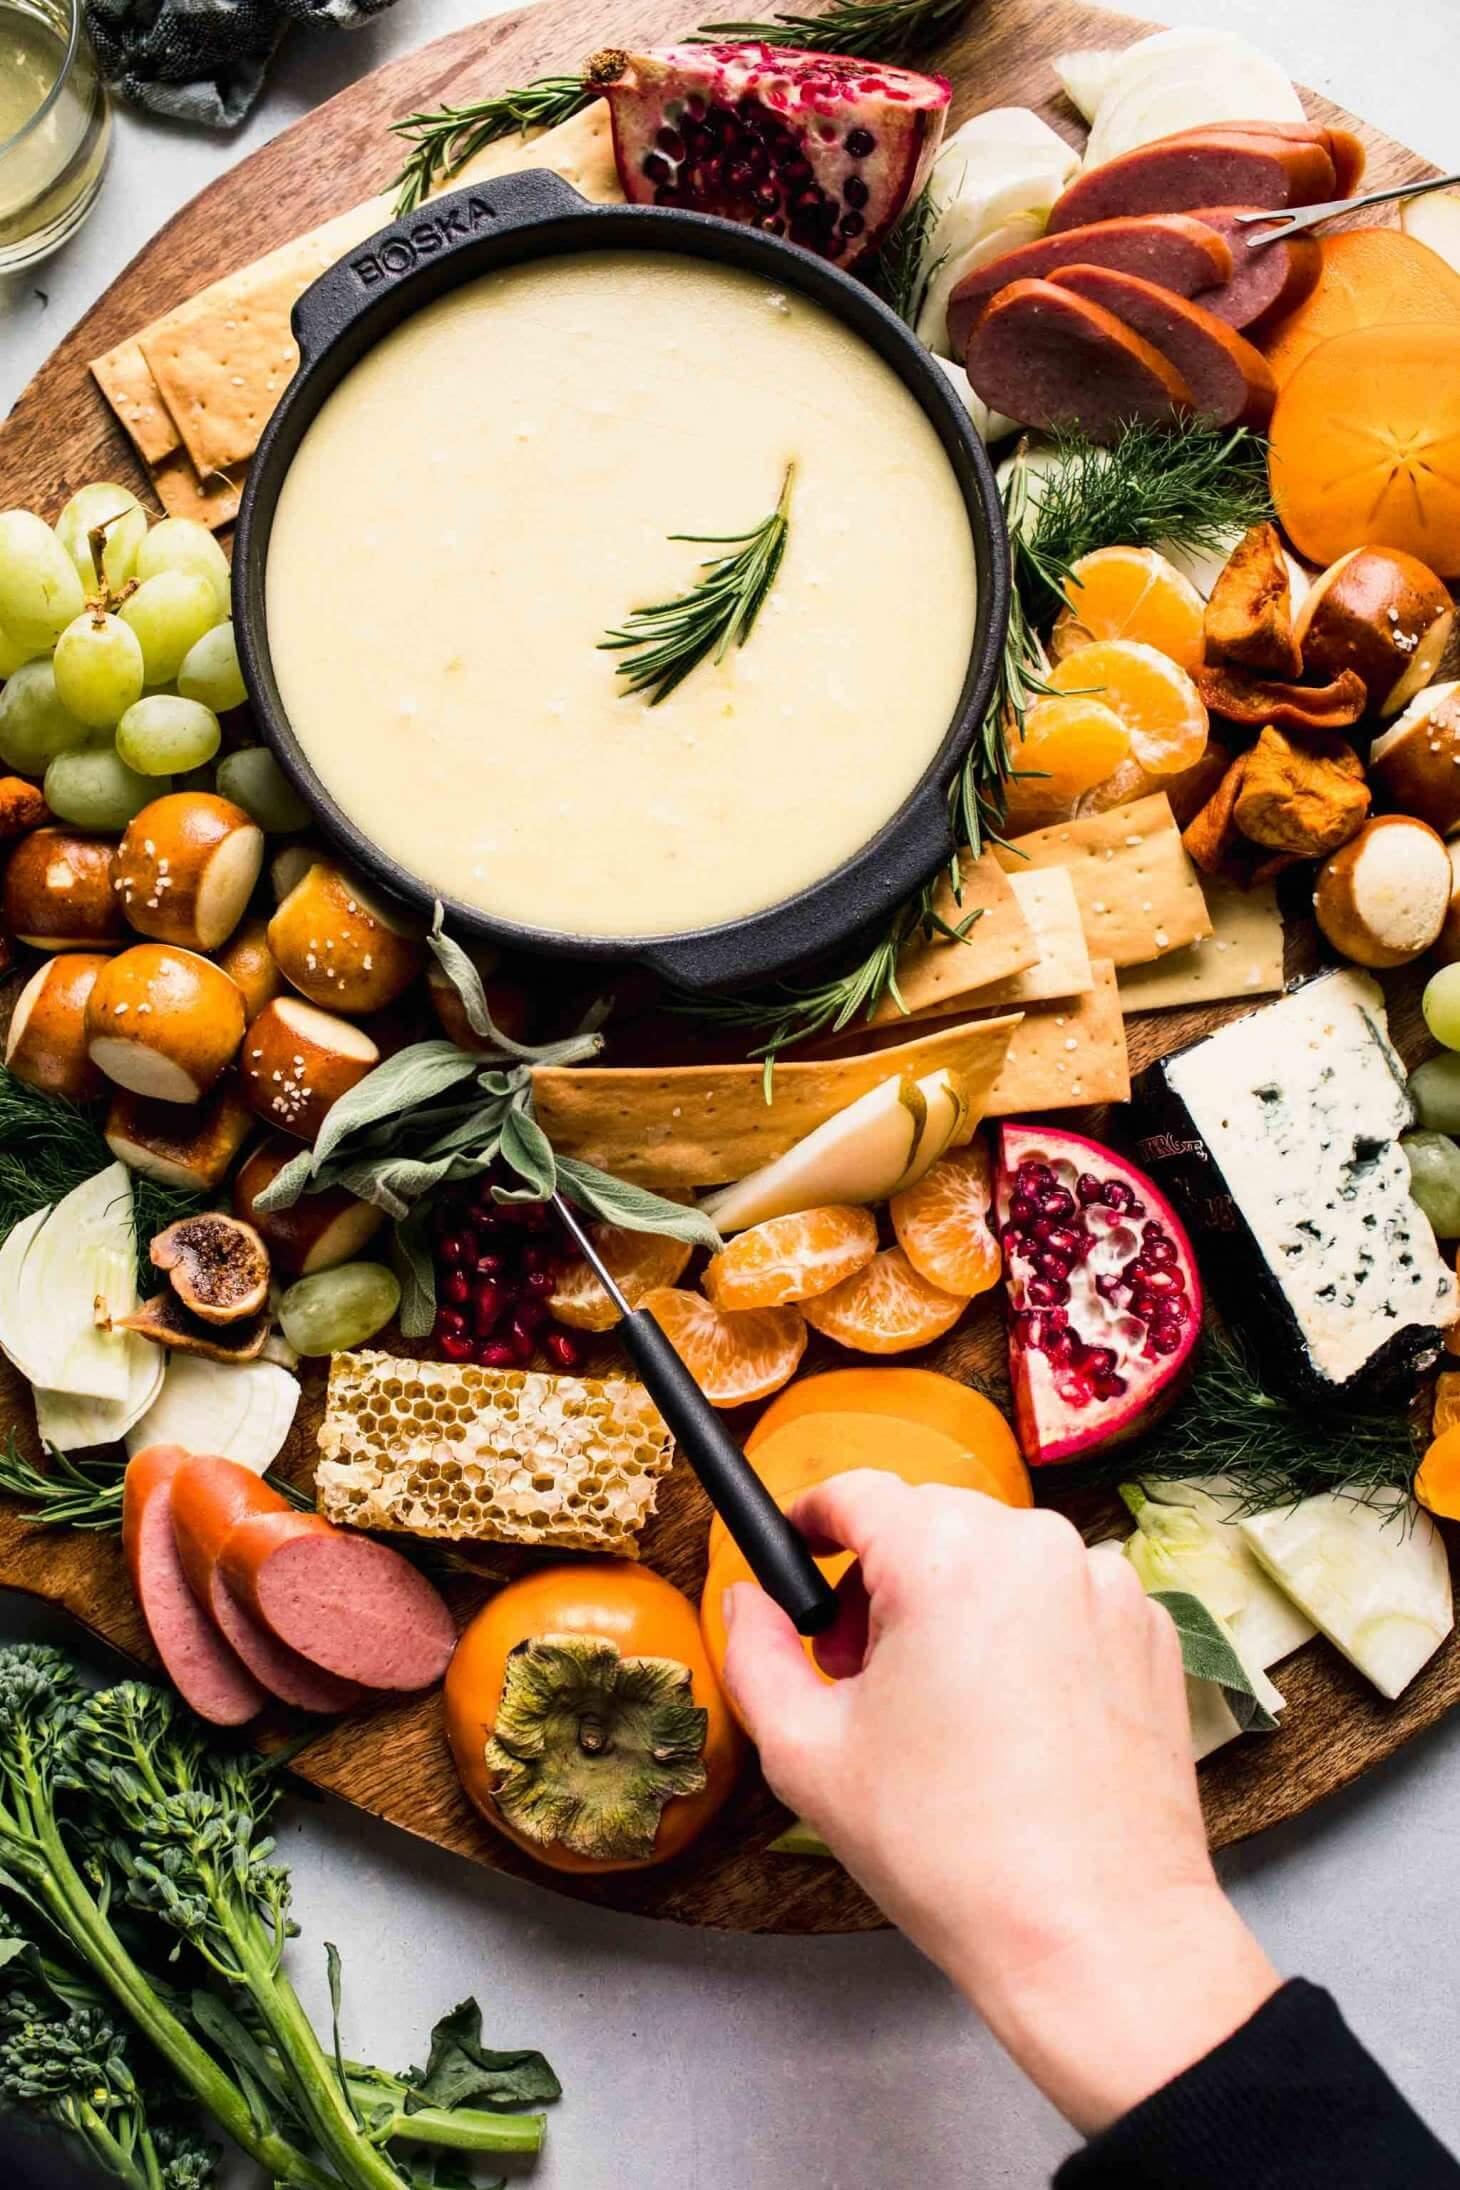 bitcoins explained simply fondue